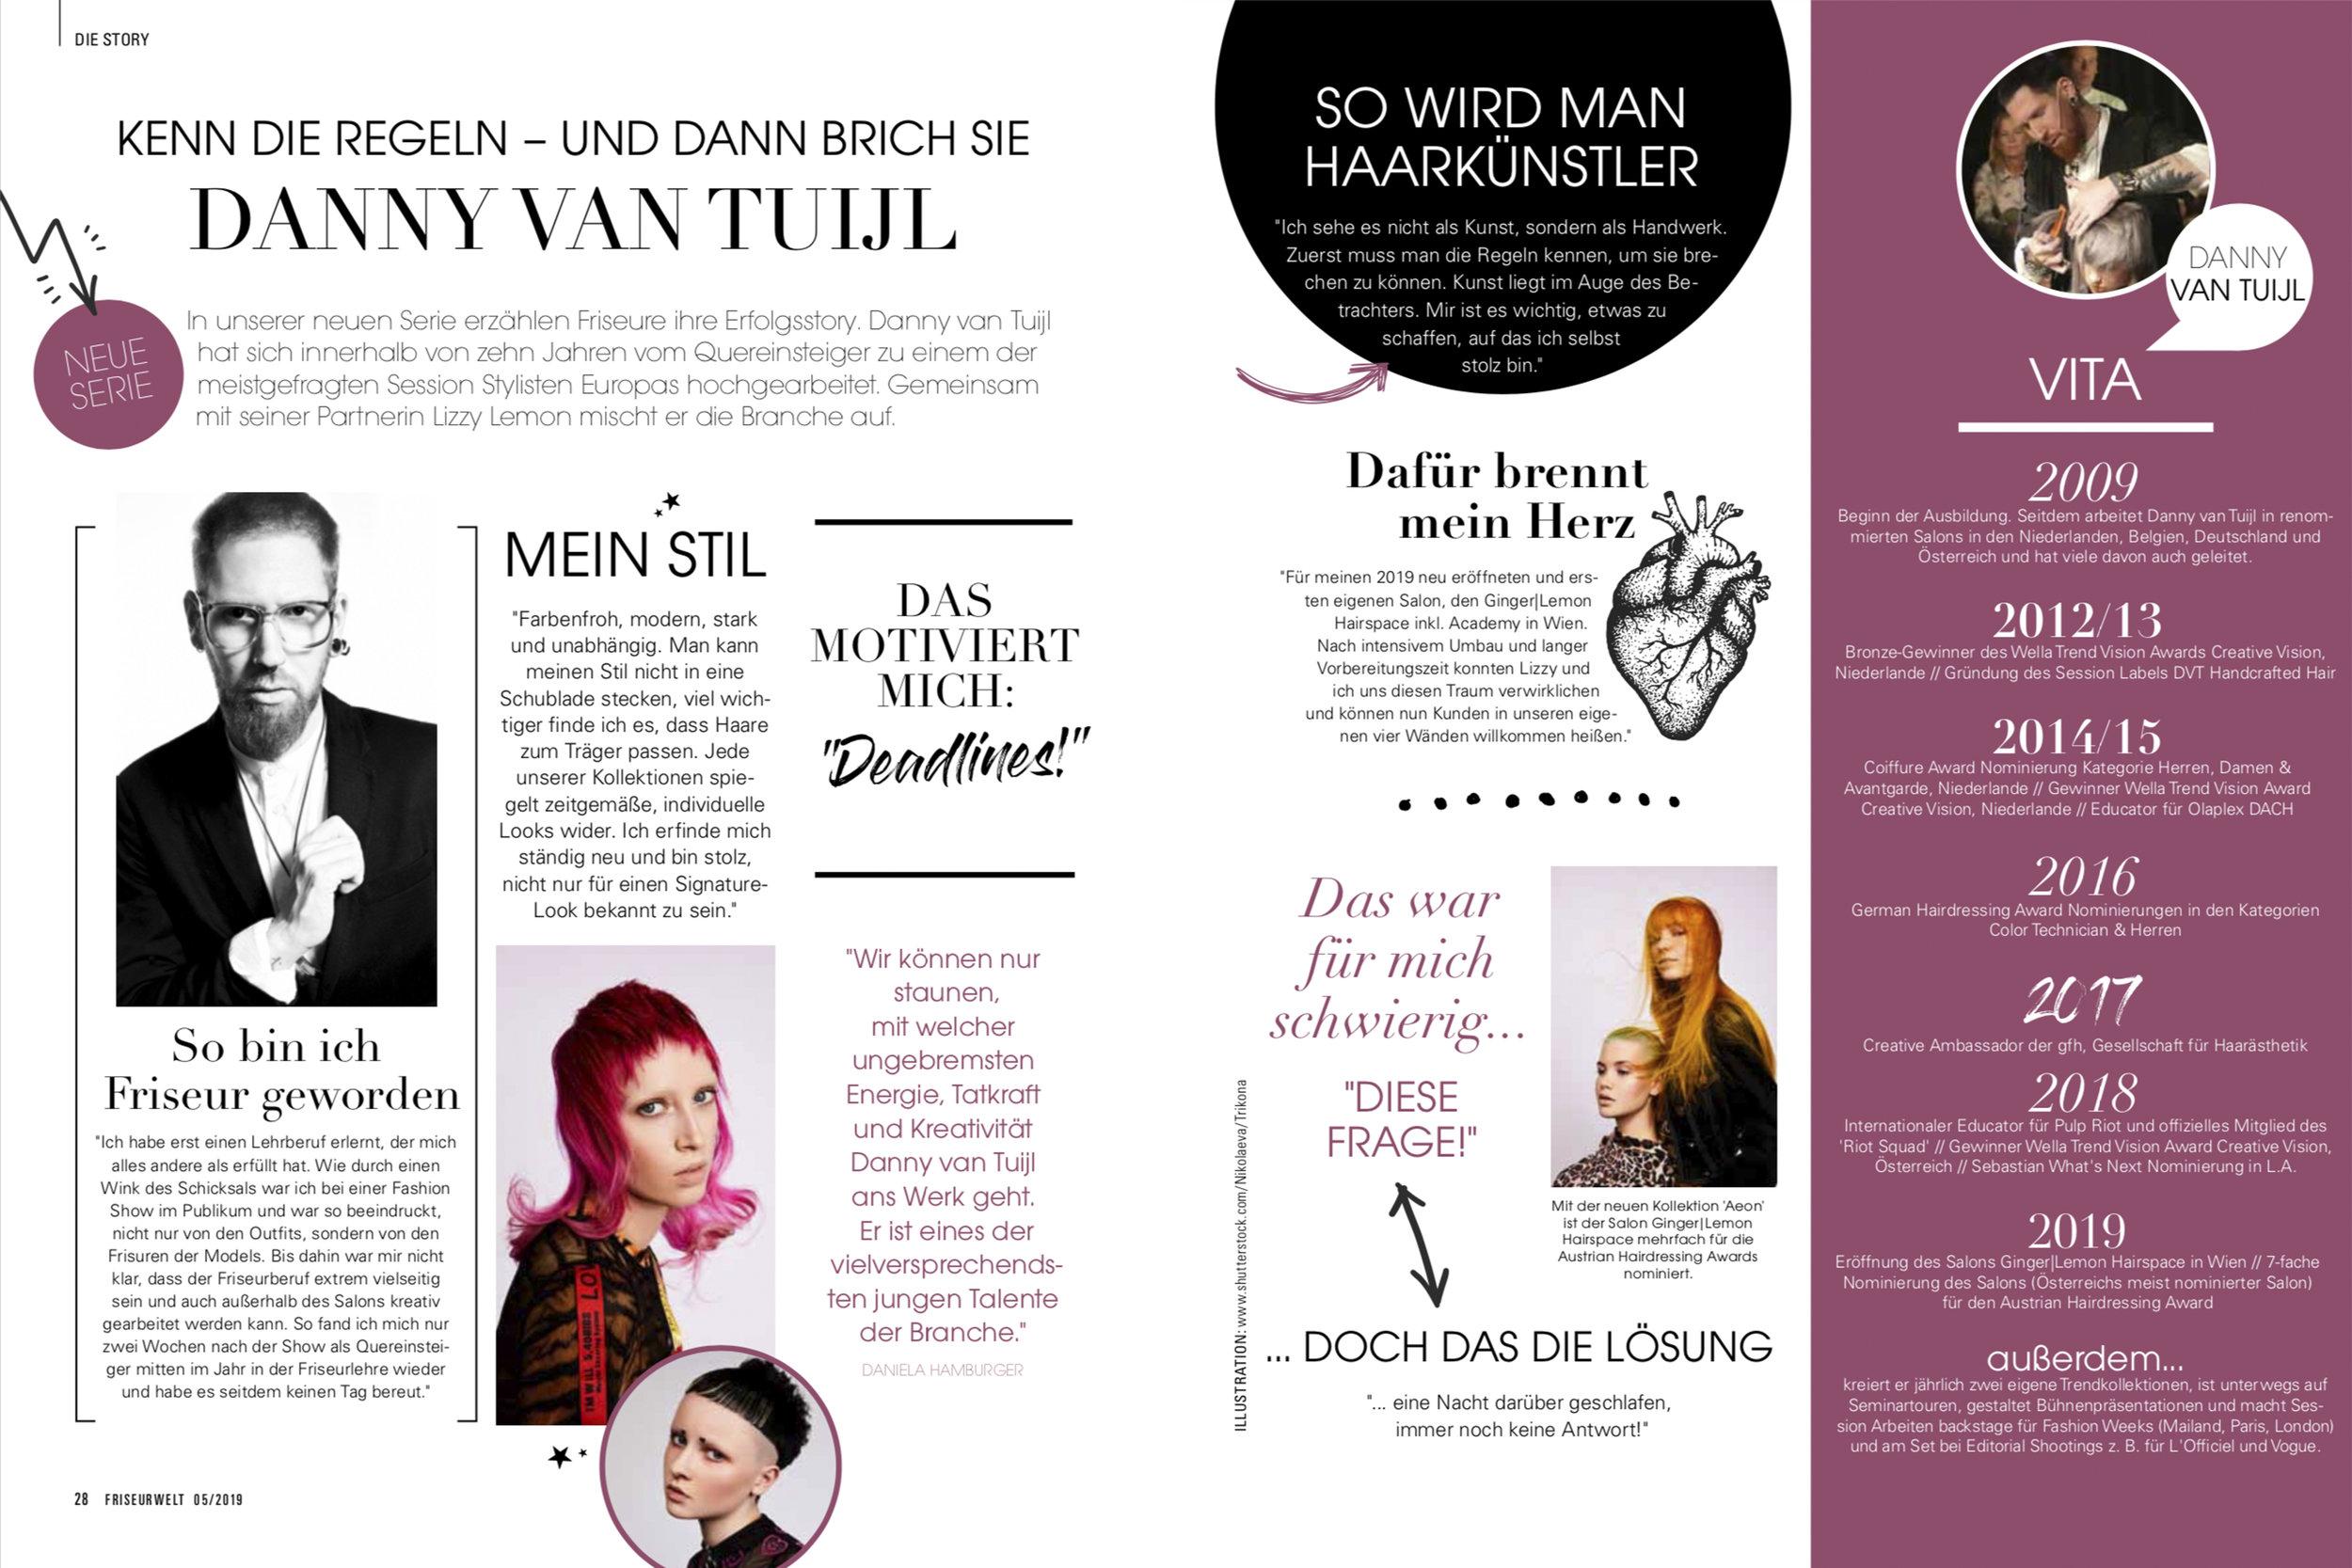 Friseurwelt_CV_Danny_VanTuijl_Gingerlemon_Hair-Wien-Friseur_Farbexperte.jpg